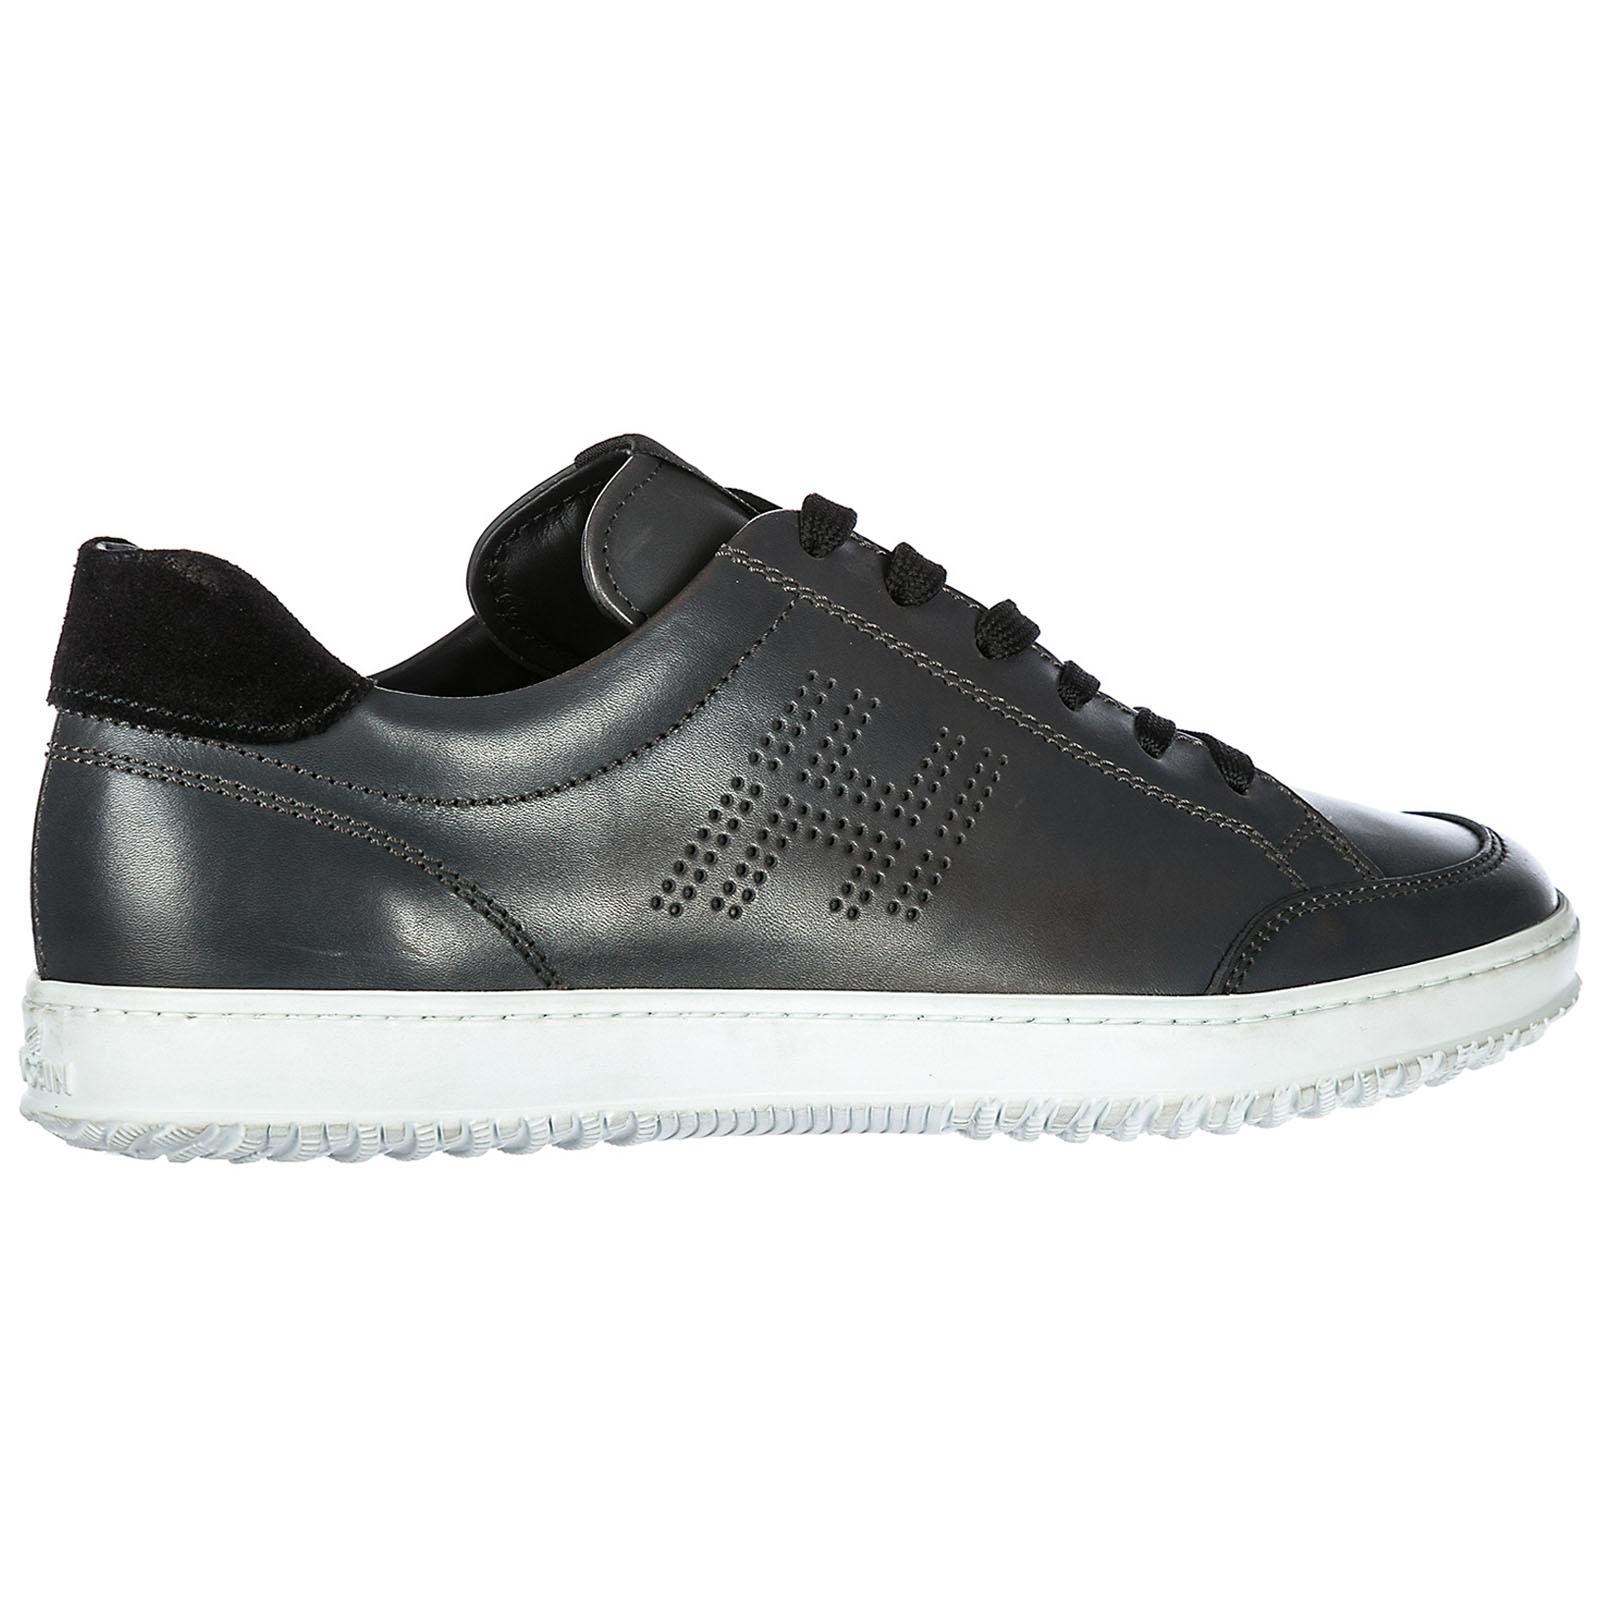 ... Scarpe sneakers uomo in pelle h168 h forata ... d29c3f3078b